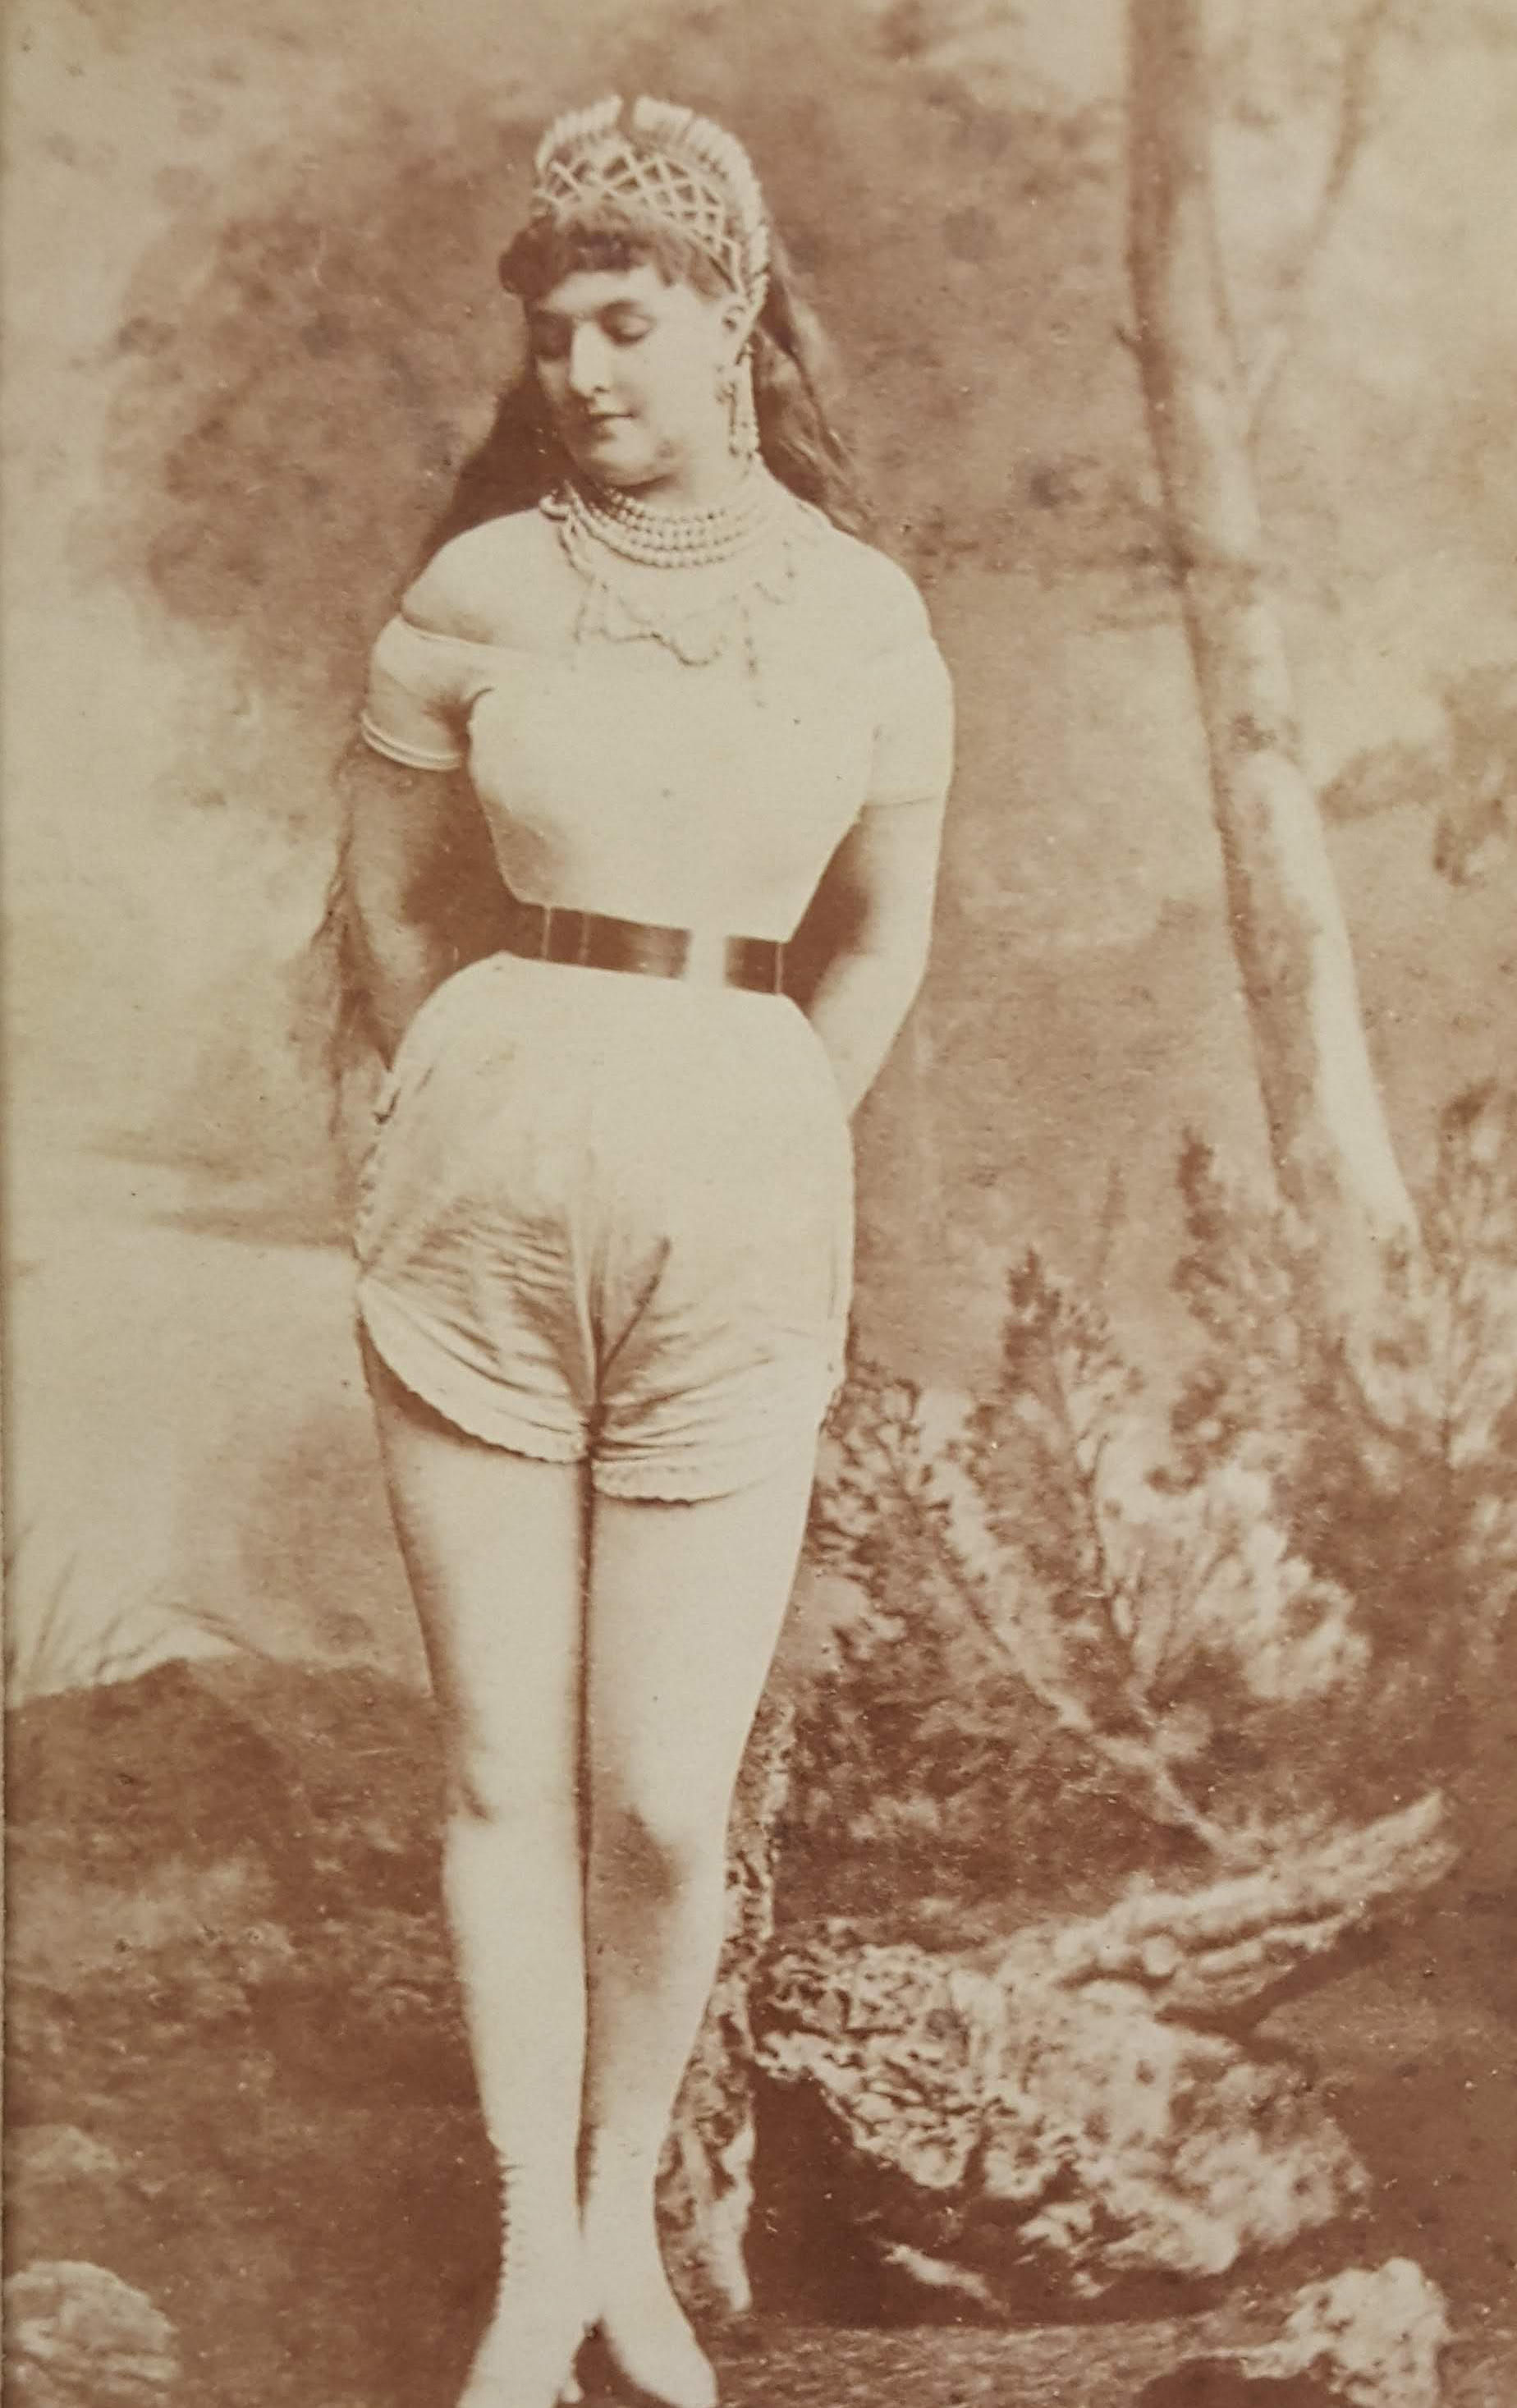 Amy Sheridan, as Lady Godiva, c. 1873, photographer unknown